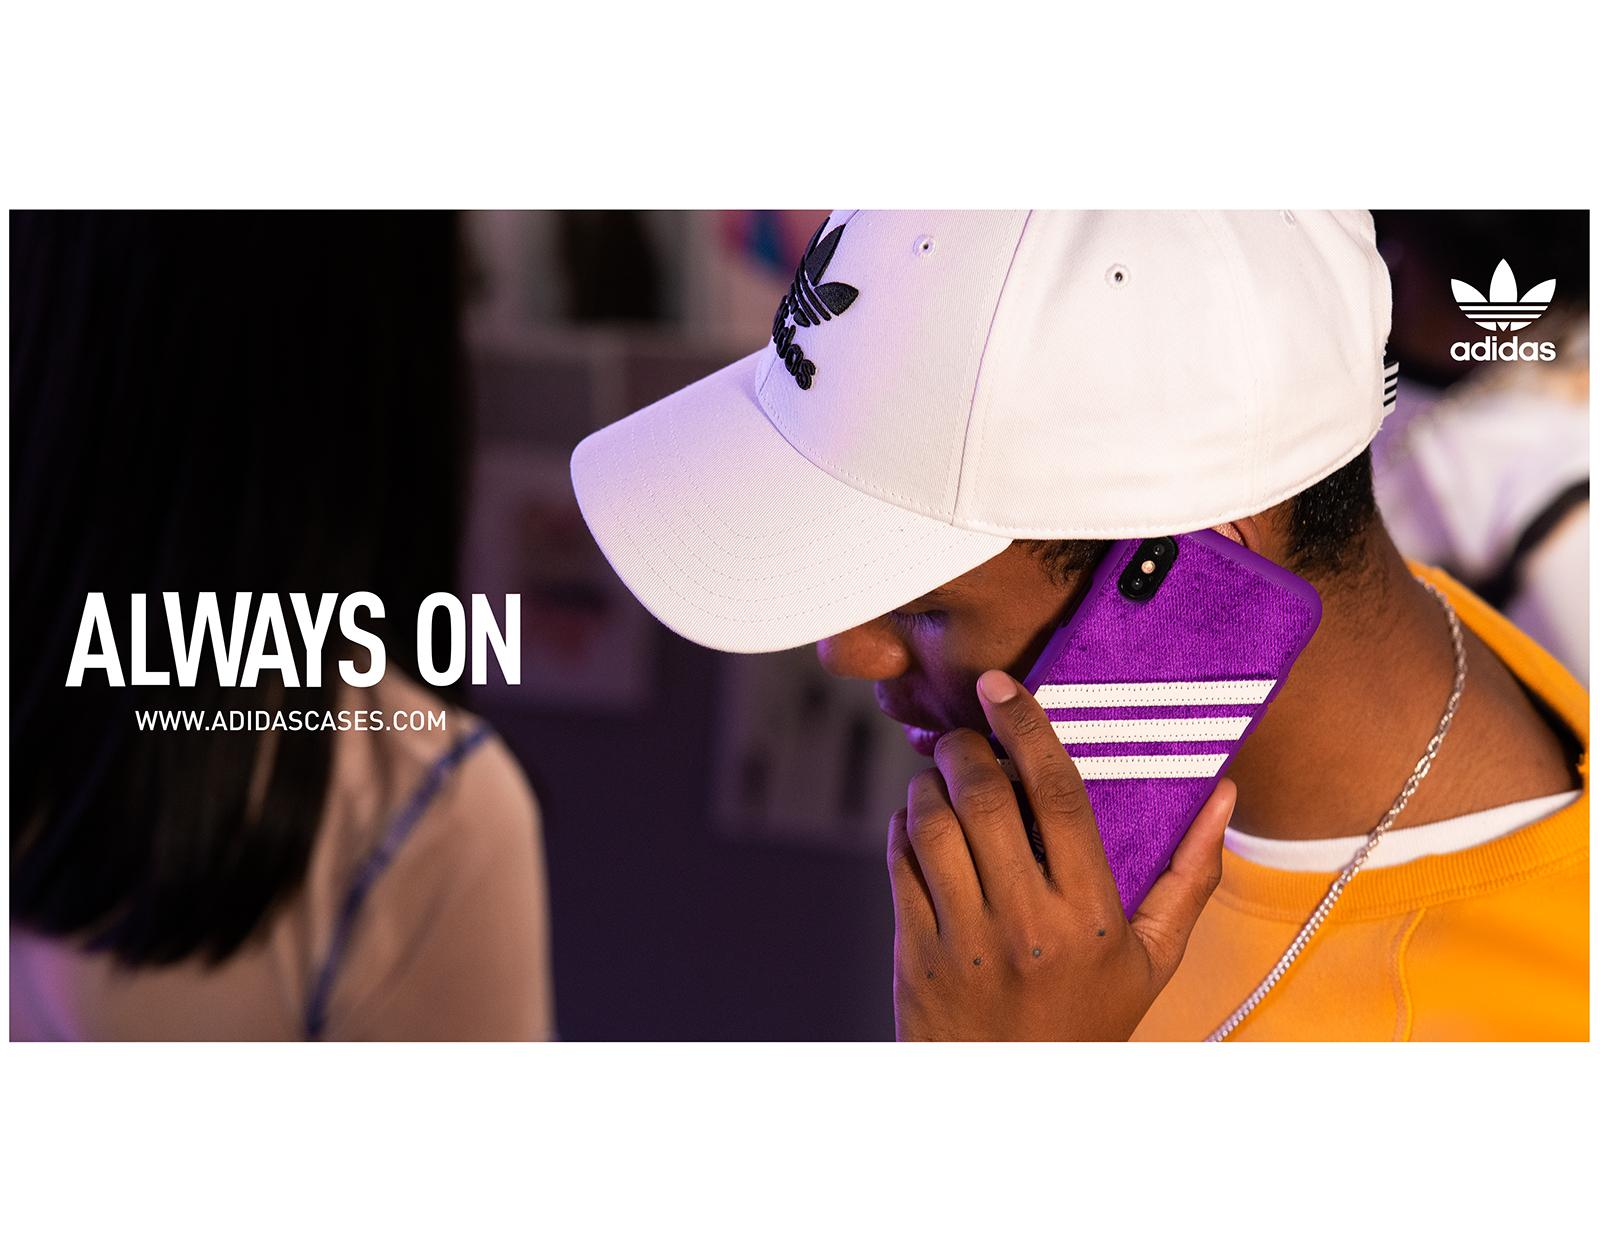 ASS_adidas_Always On 03.jpg